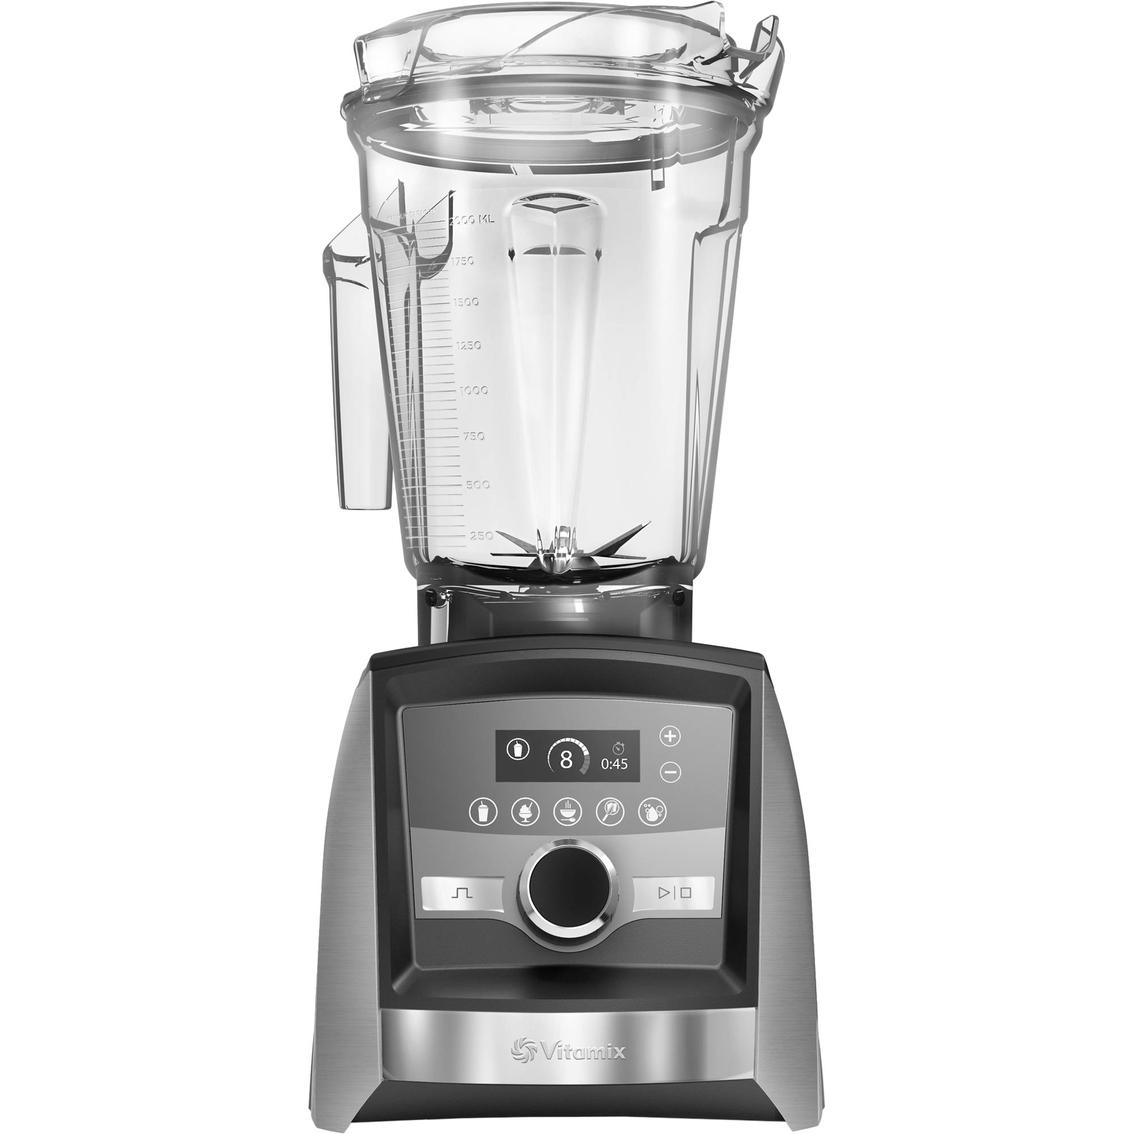 Vitamix Ascent 3500 Blender | Blenders | Home & Appliances